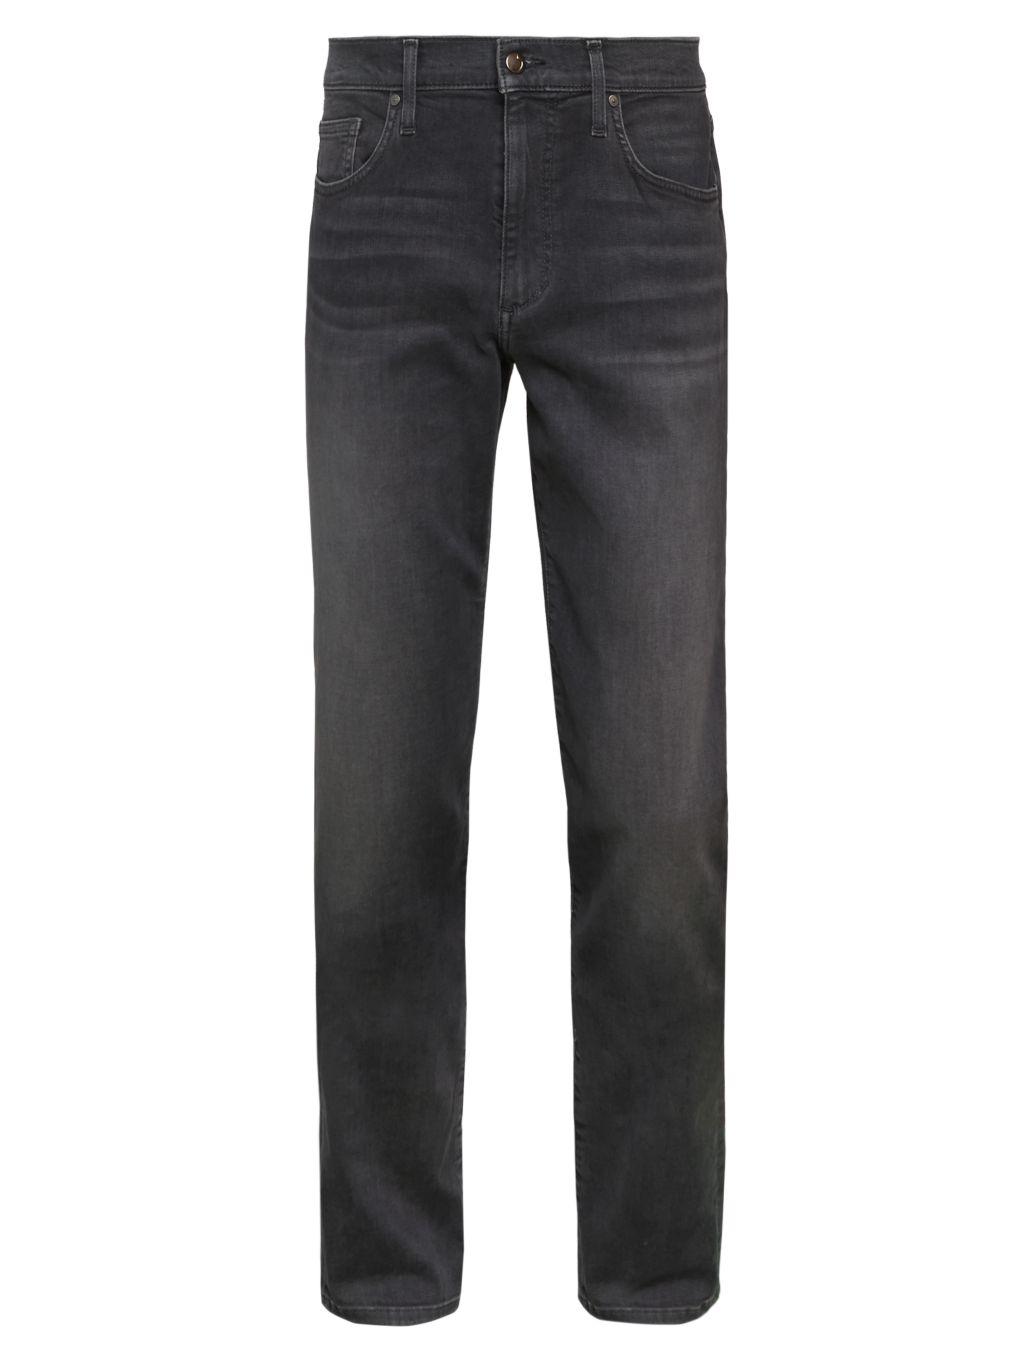 Joe's Jeans The Brixton Straight-Leg Jeans